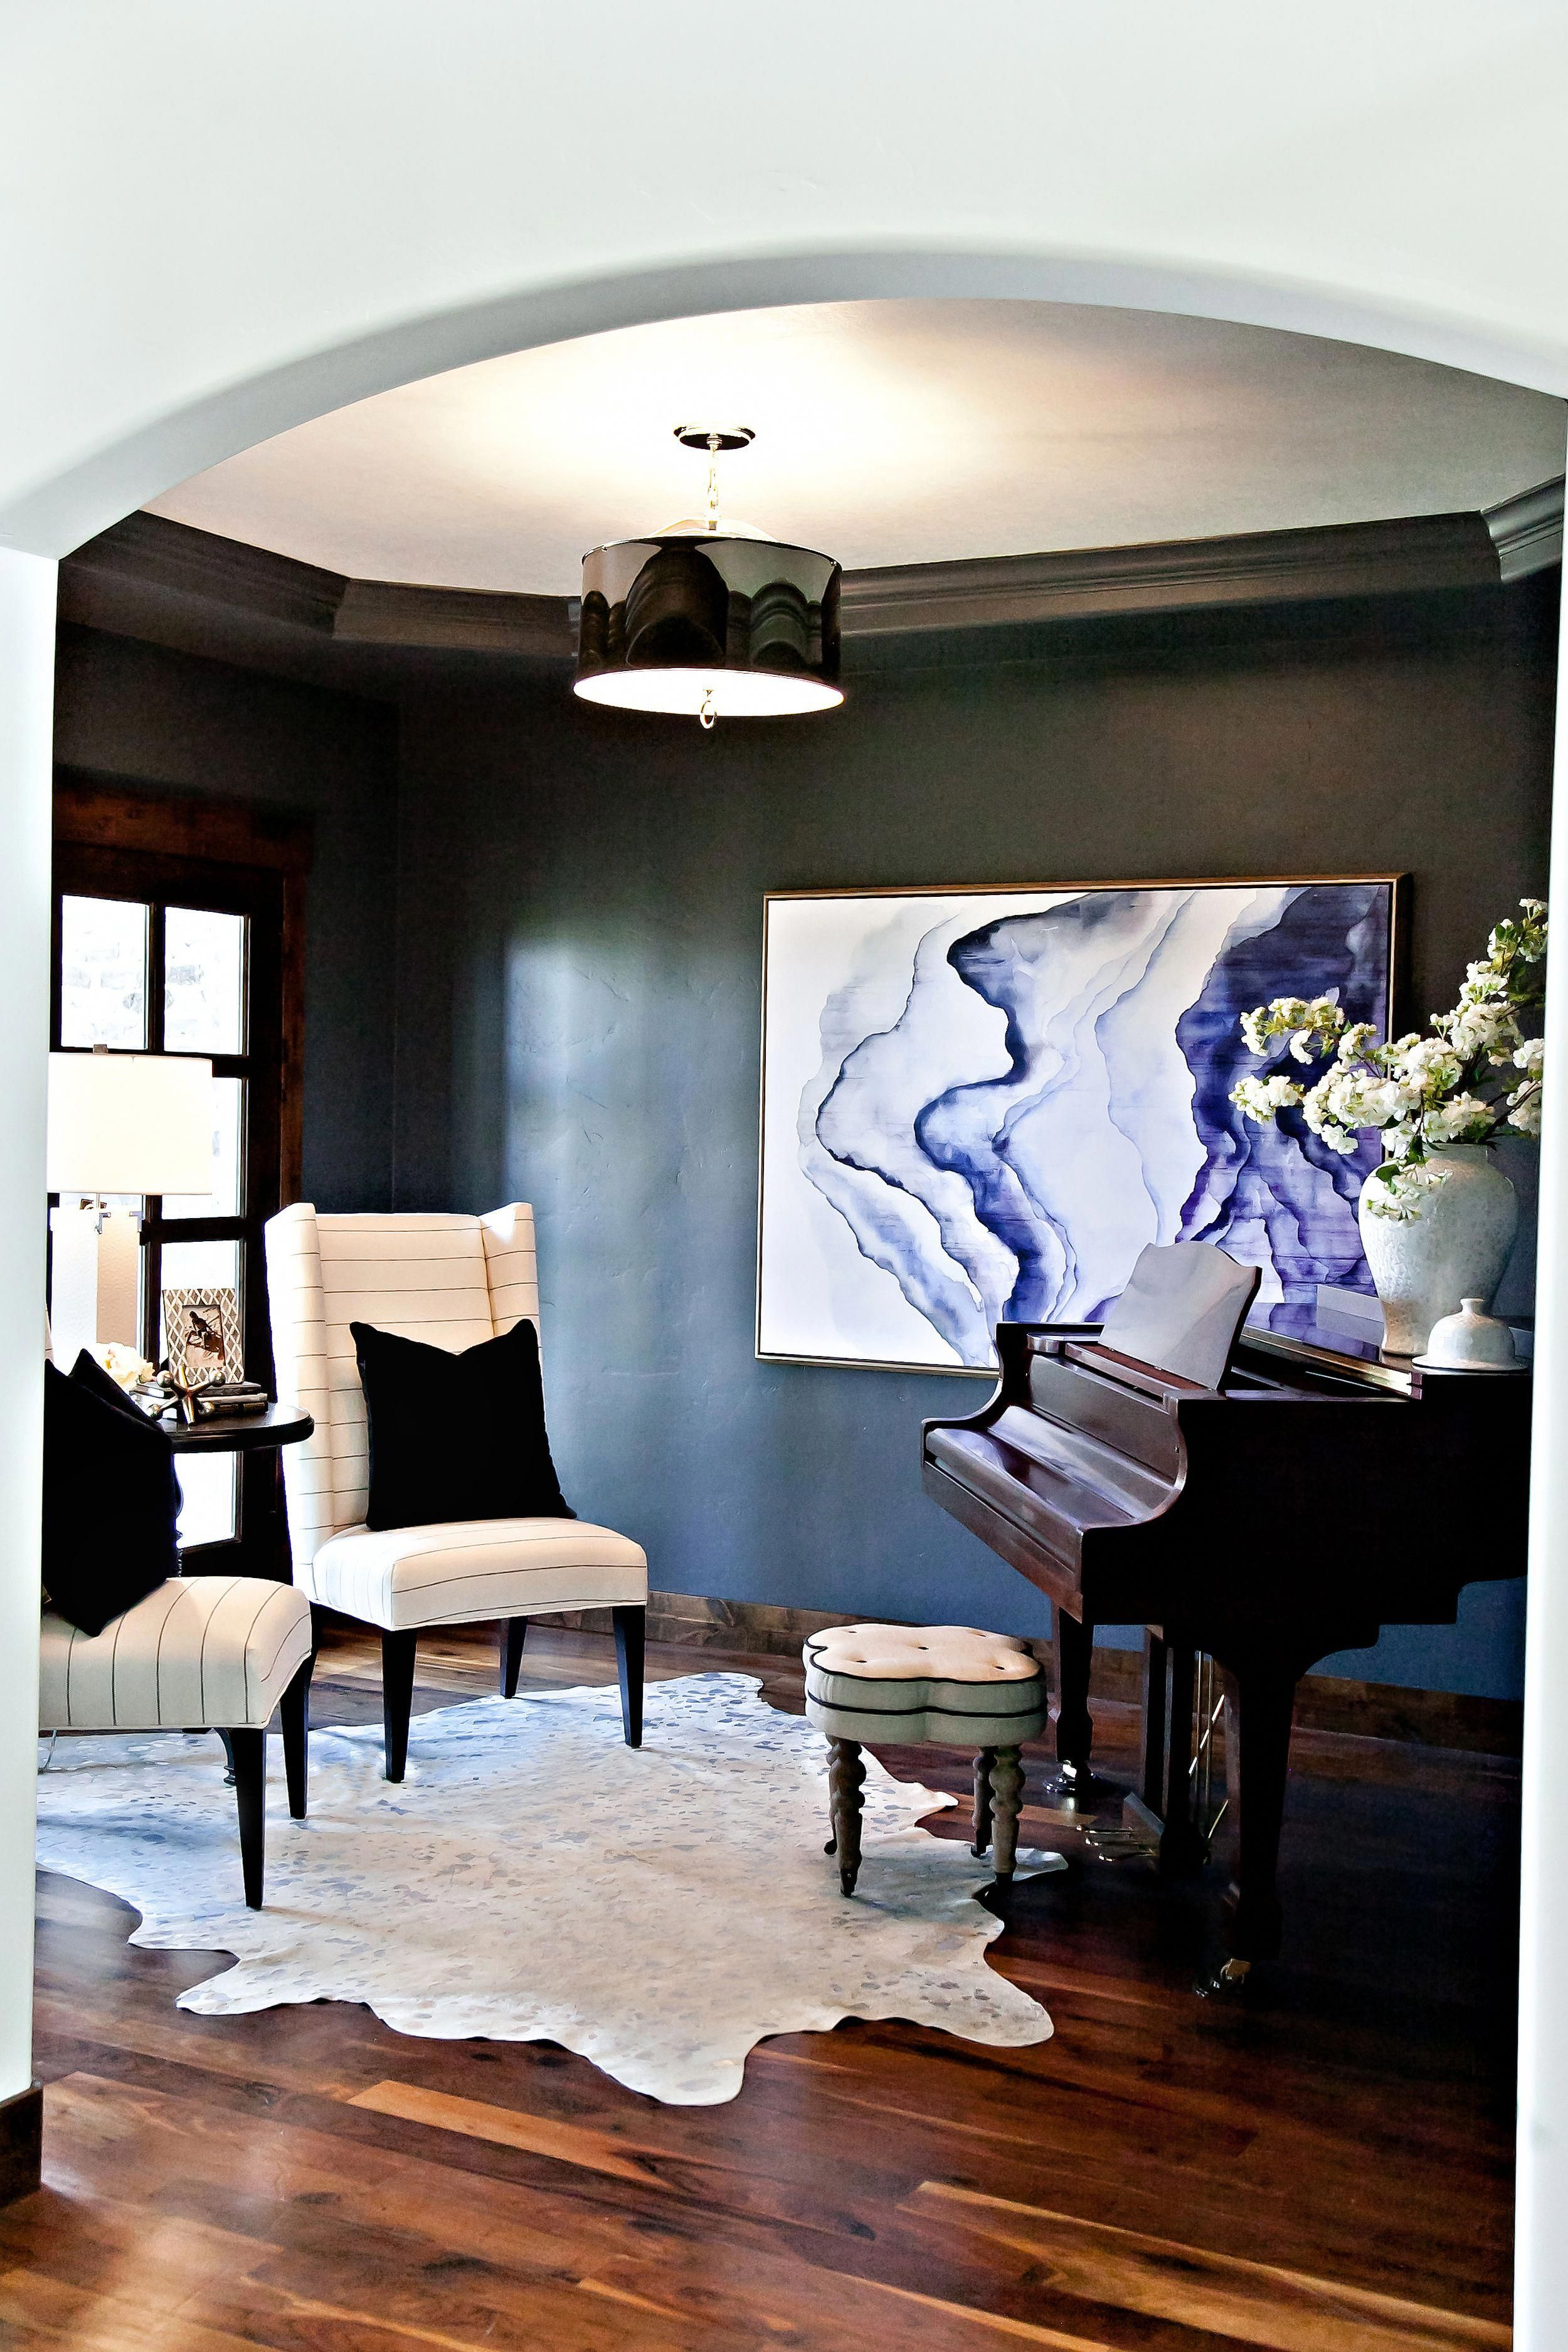 Formal Sitting Room With Metallic Cowhide Rug Navy Walls Grand Piano And Abstract Indigo Ink Artwork Li Piano Room Decor Piano Living Rooms Grand Piano Room